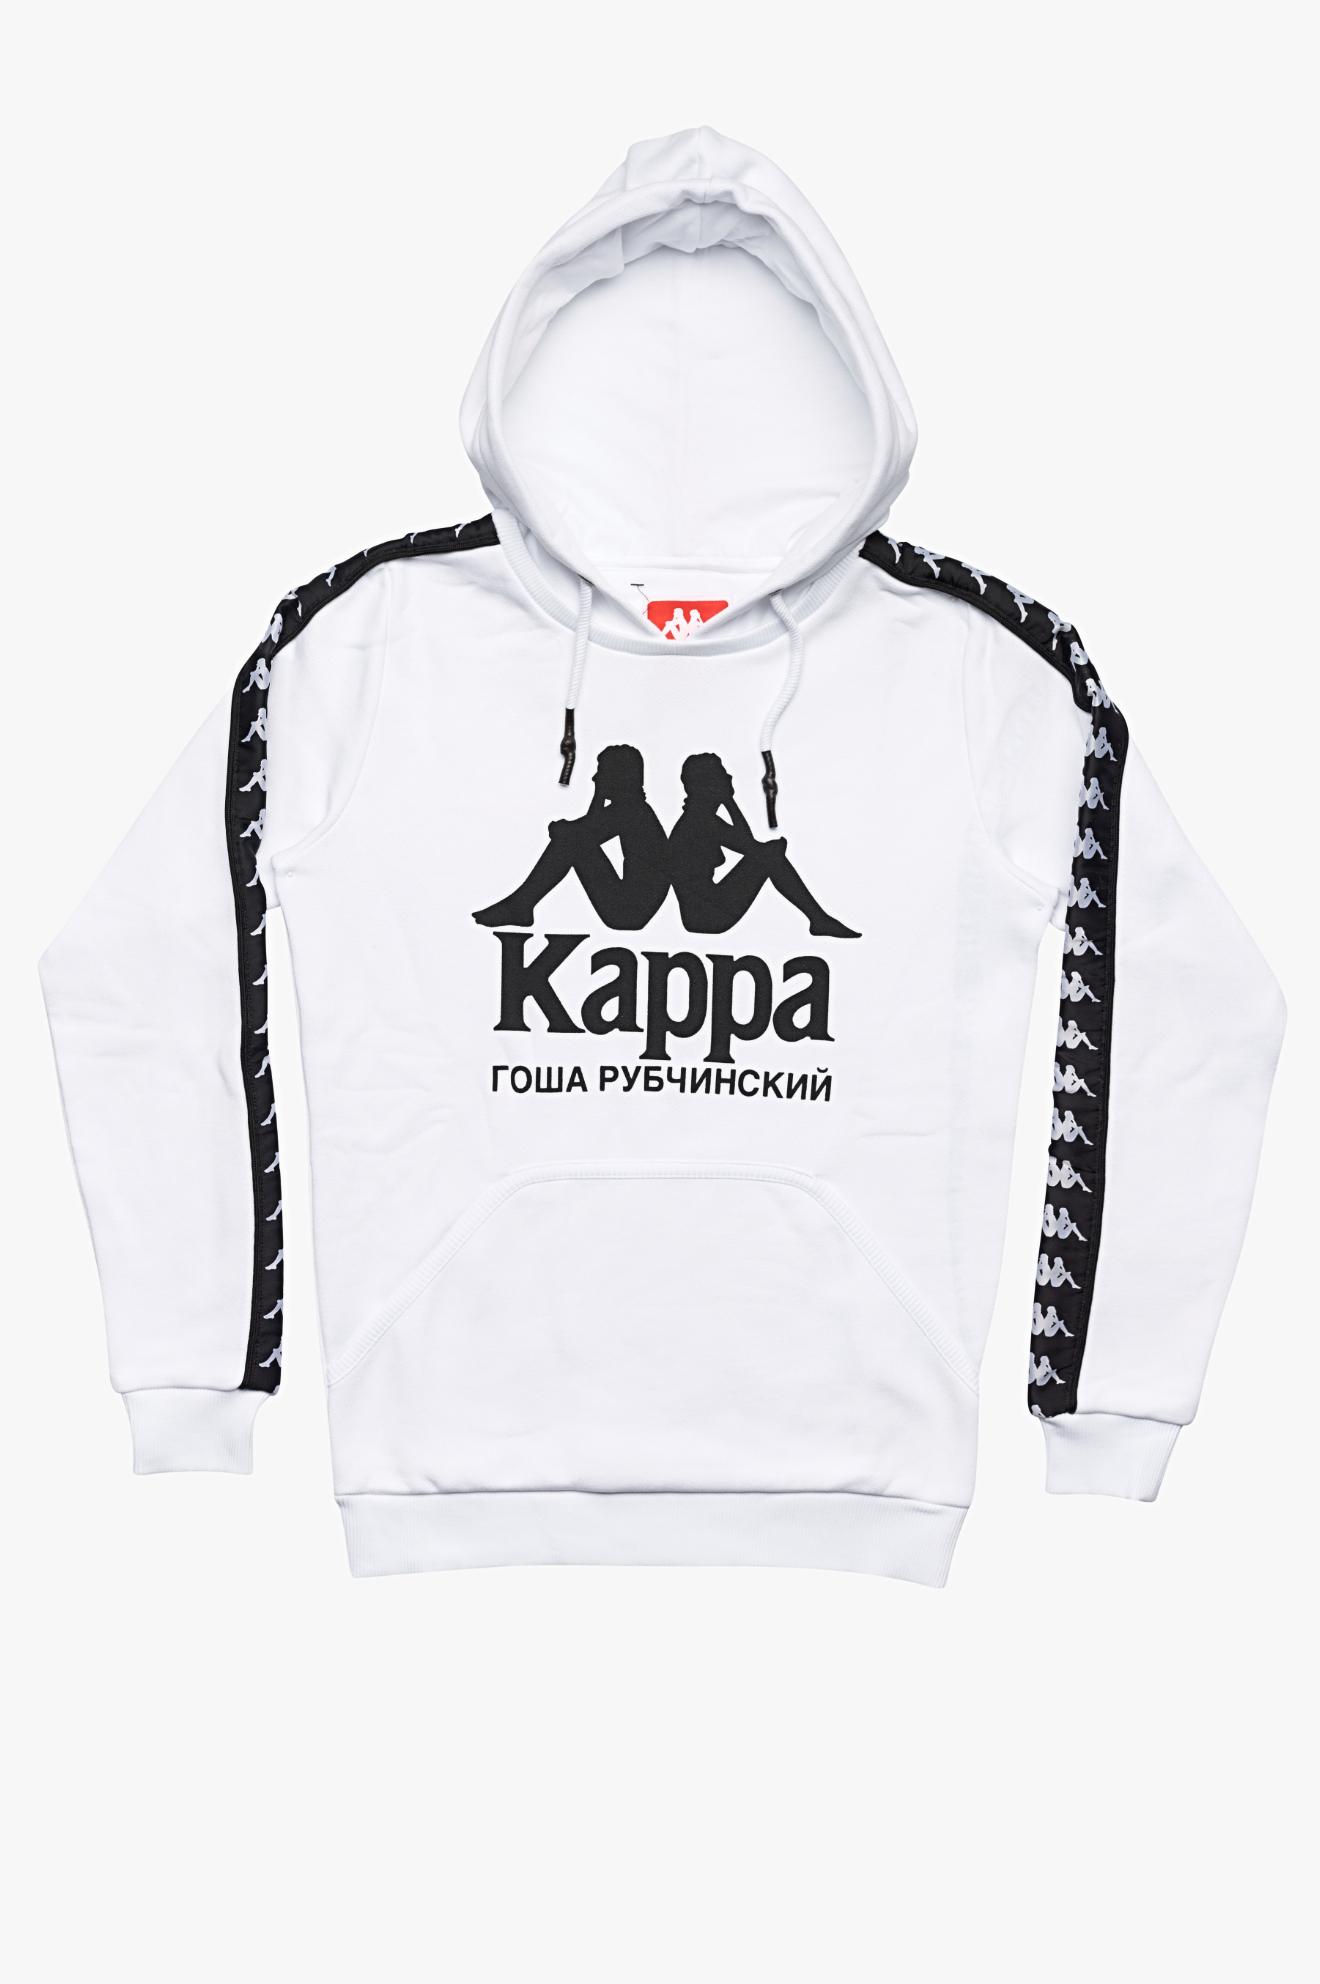 Kappa Hooded Sweatshirt White